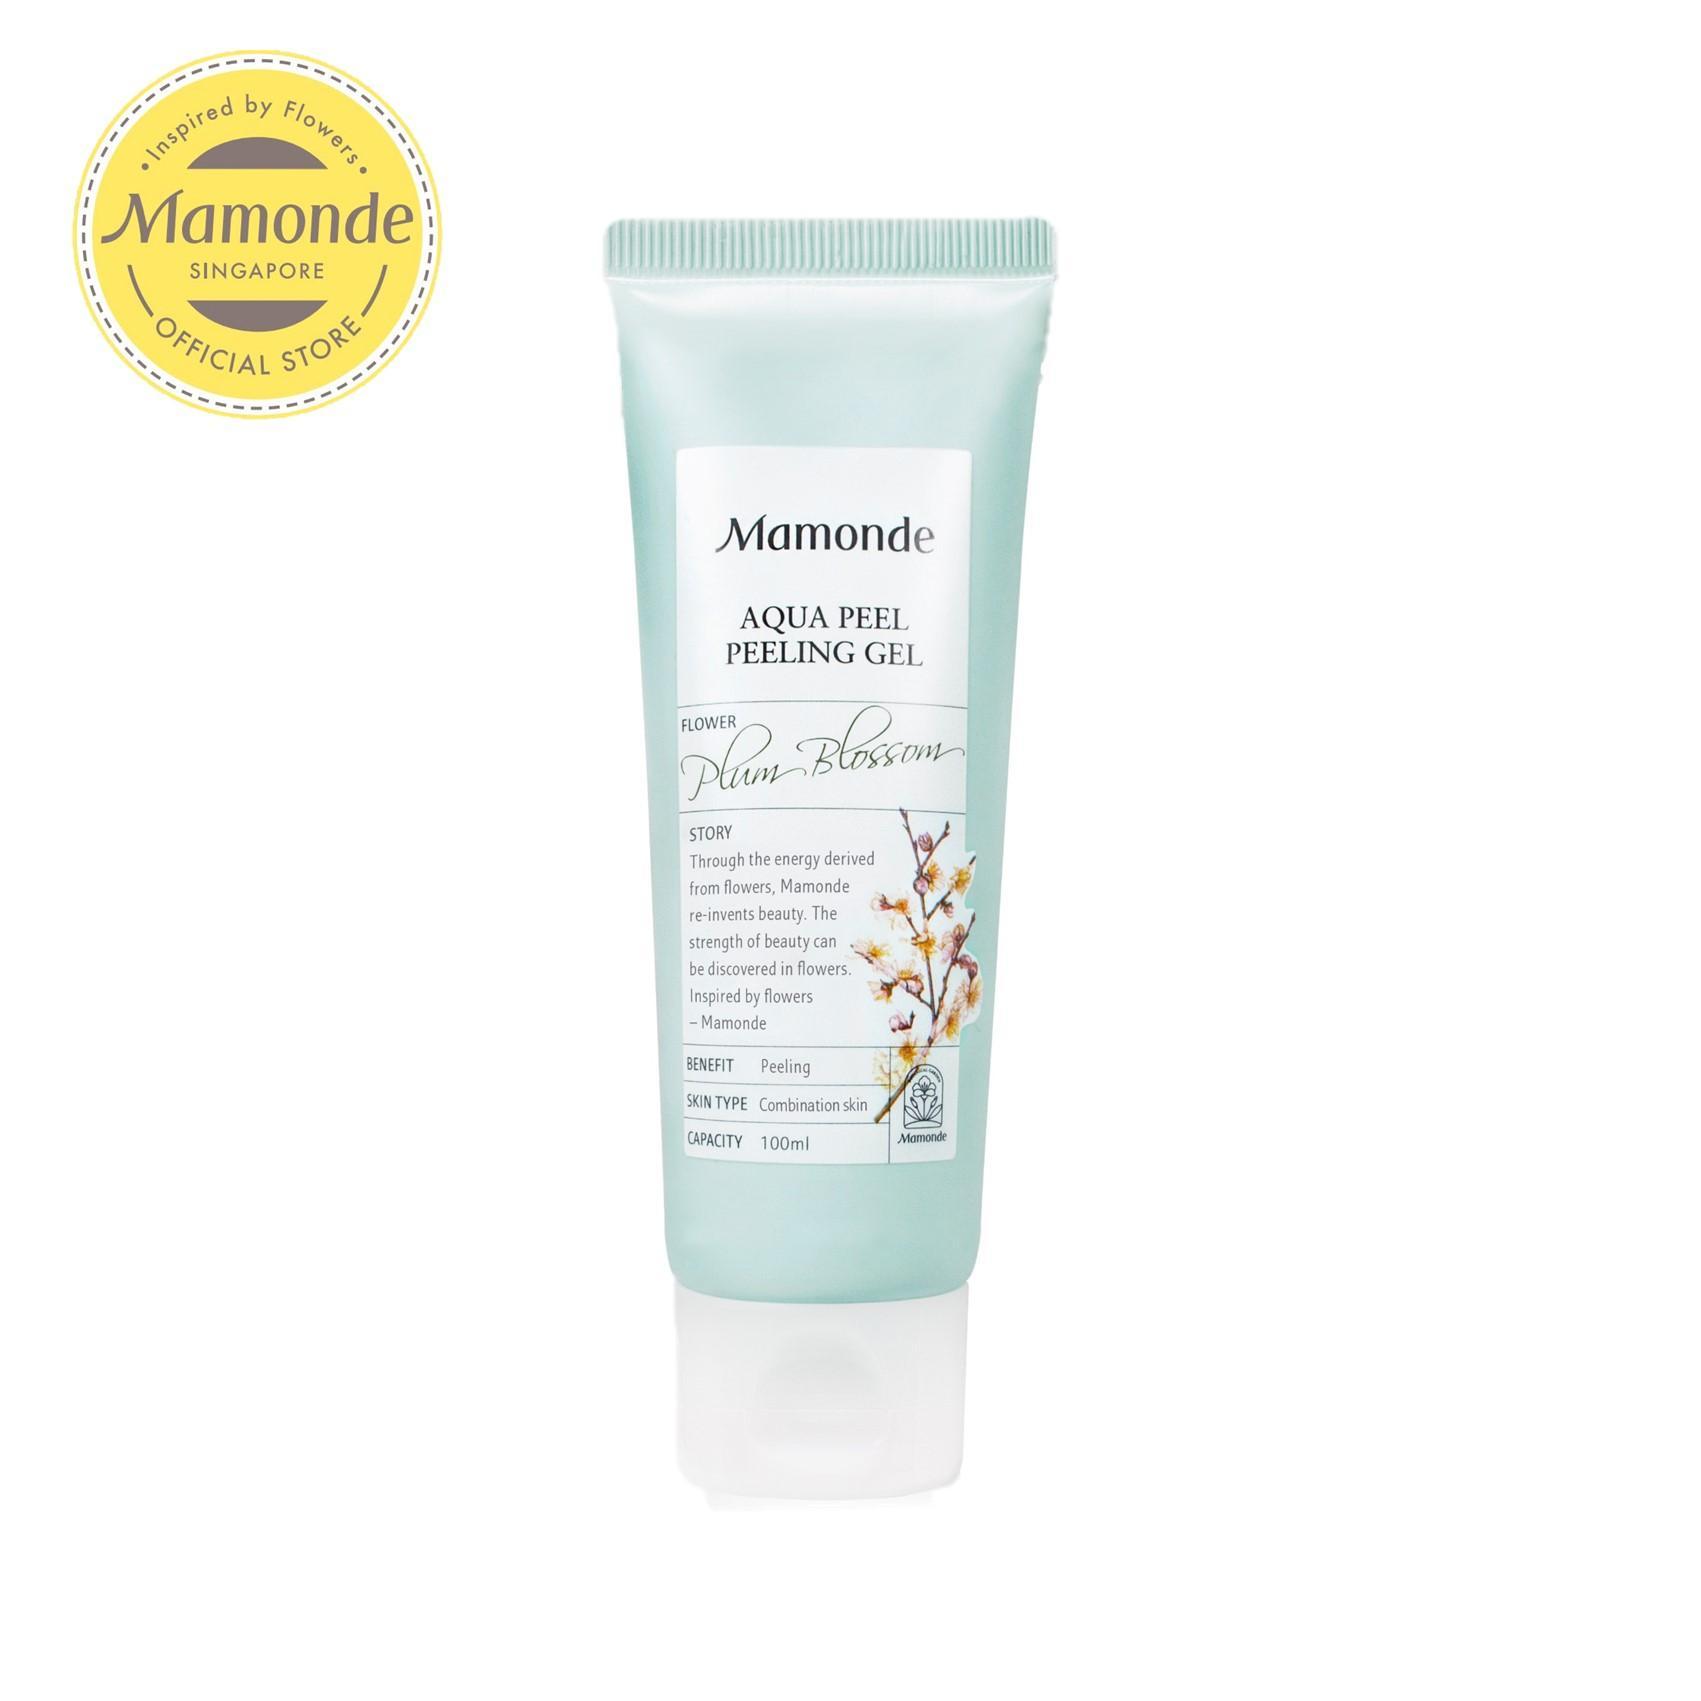 Mamonde Aqua Peel Peeling Gel 100ml By Mamonde (capitaland Merchant).